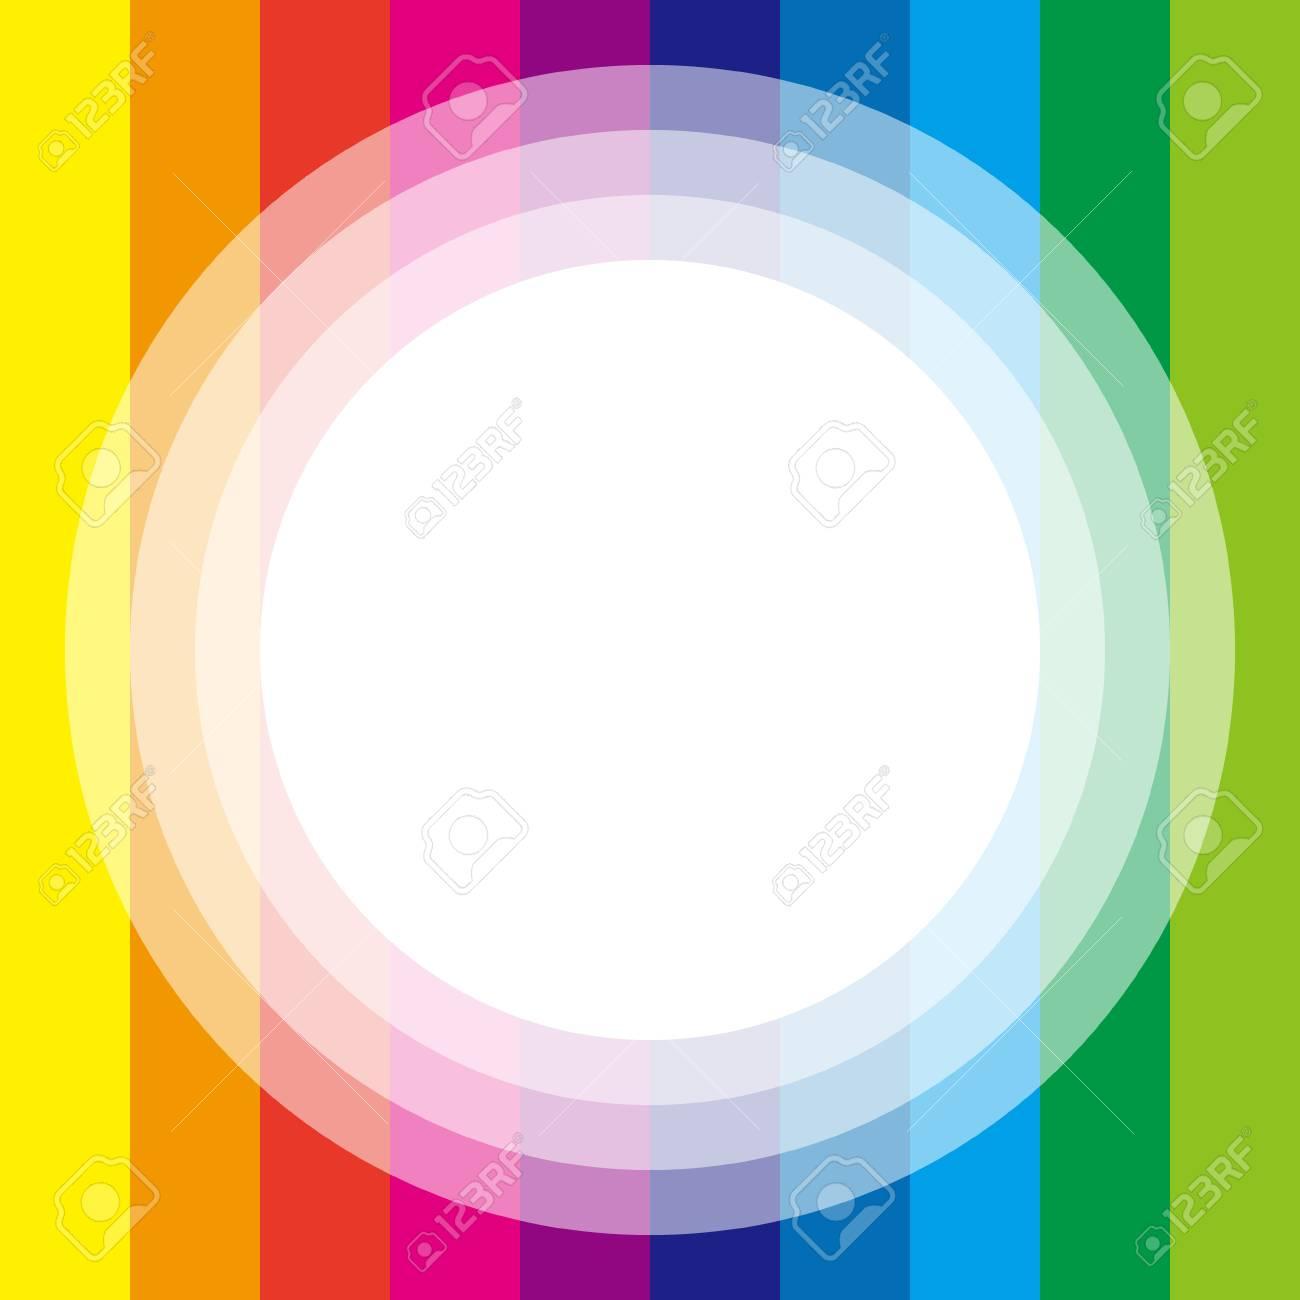 Hintergrundmaterial Hintergrundbild, Regenbogen, Regenbogen, Bunt ...